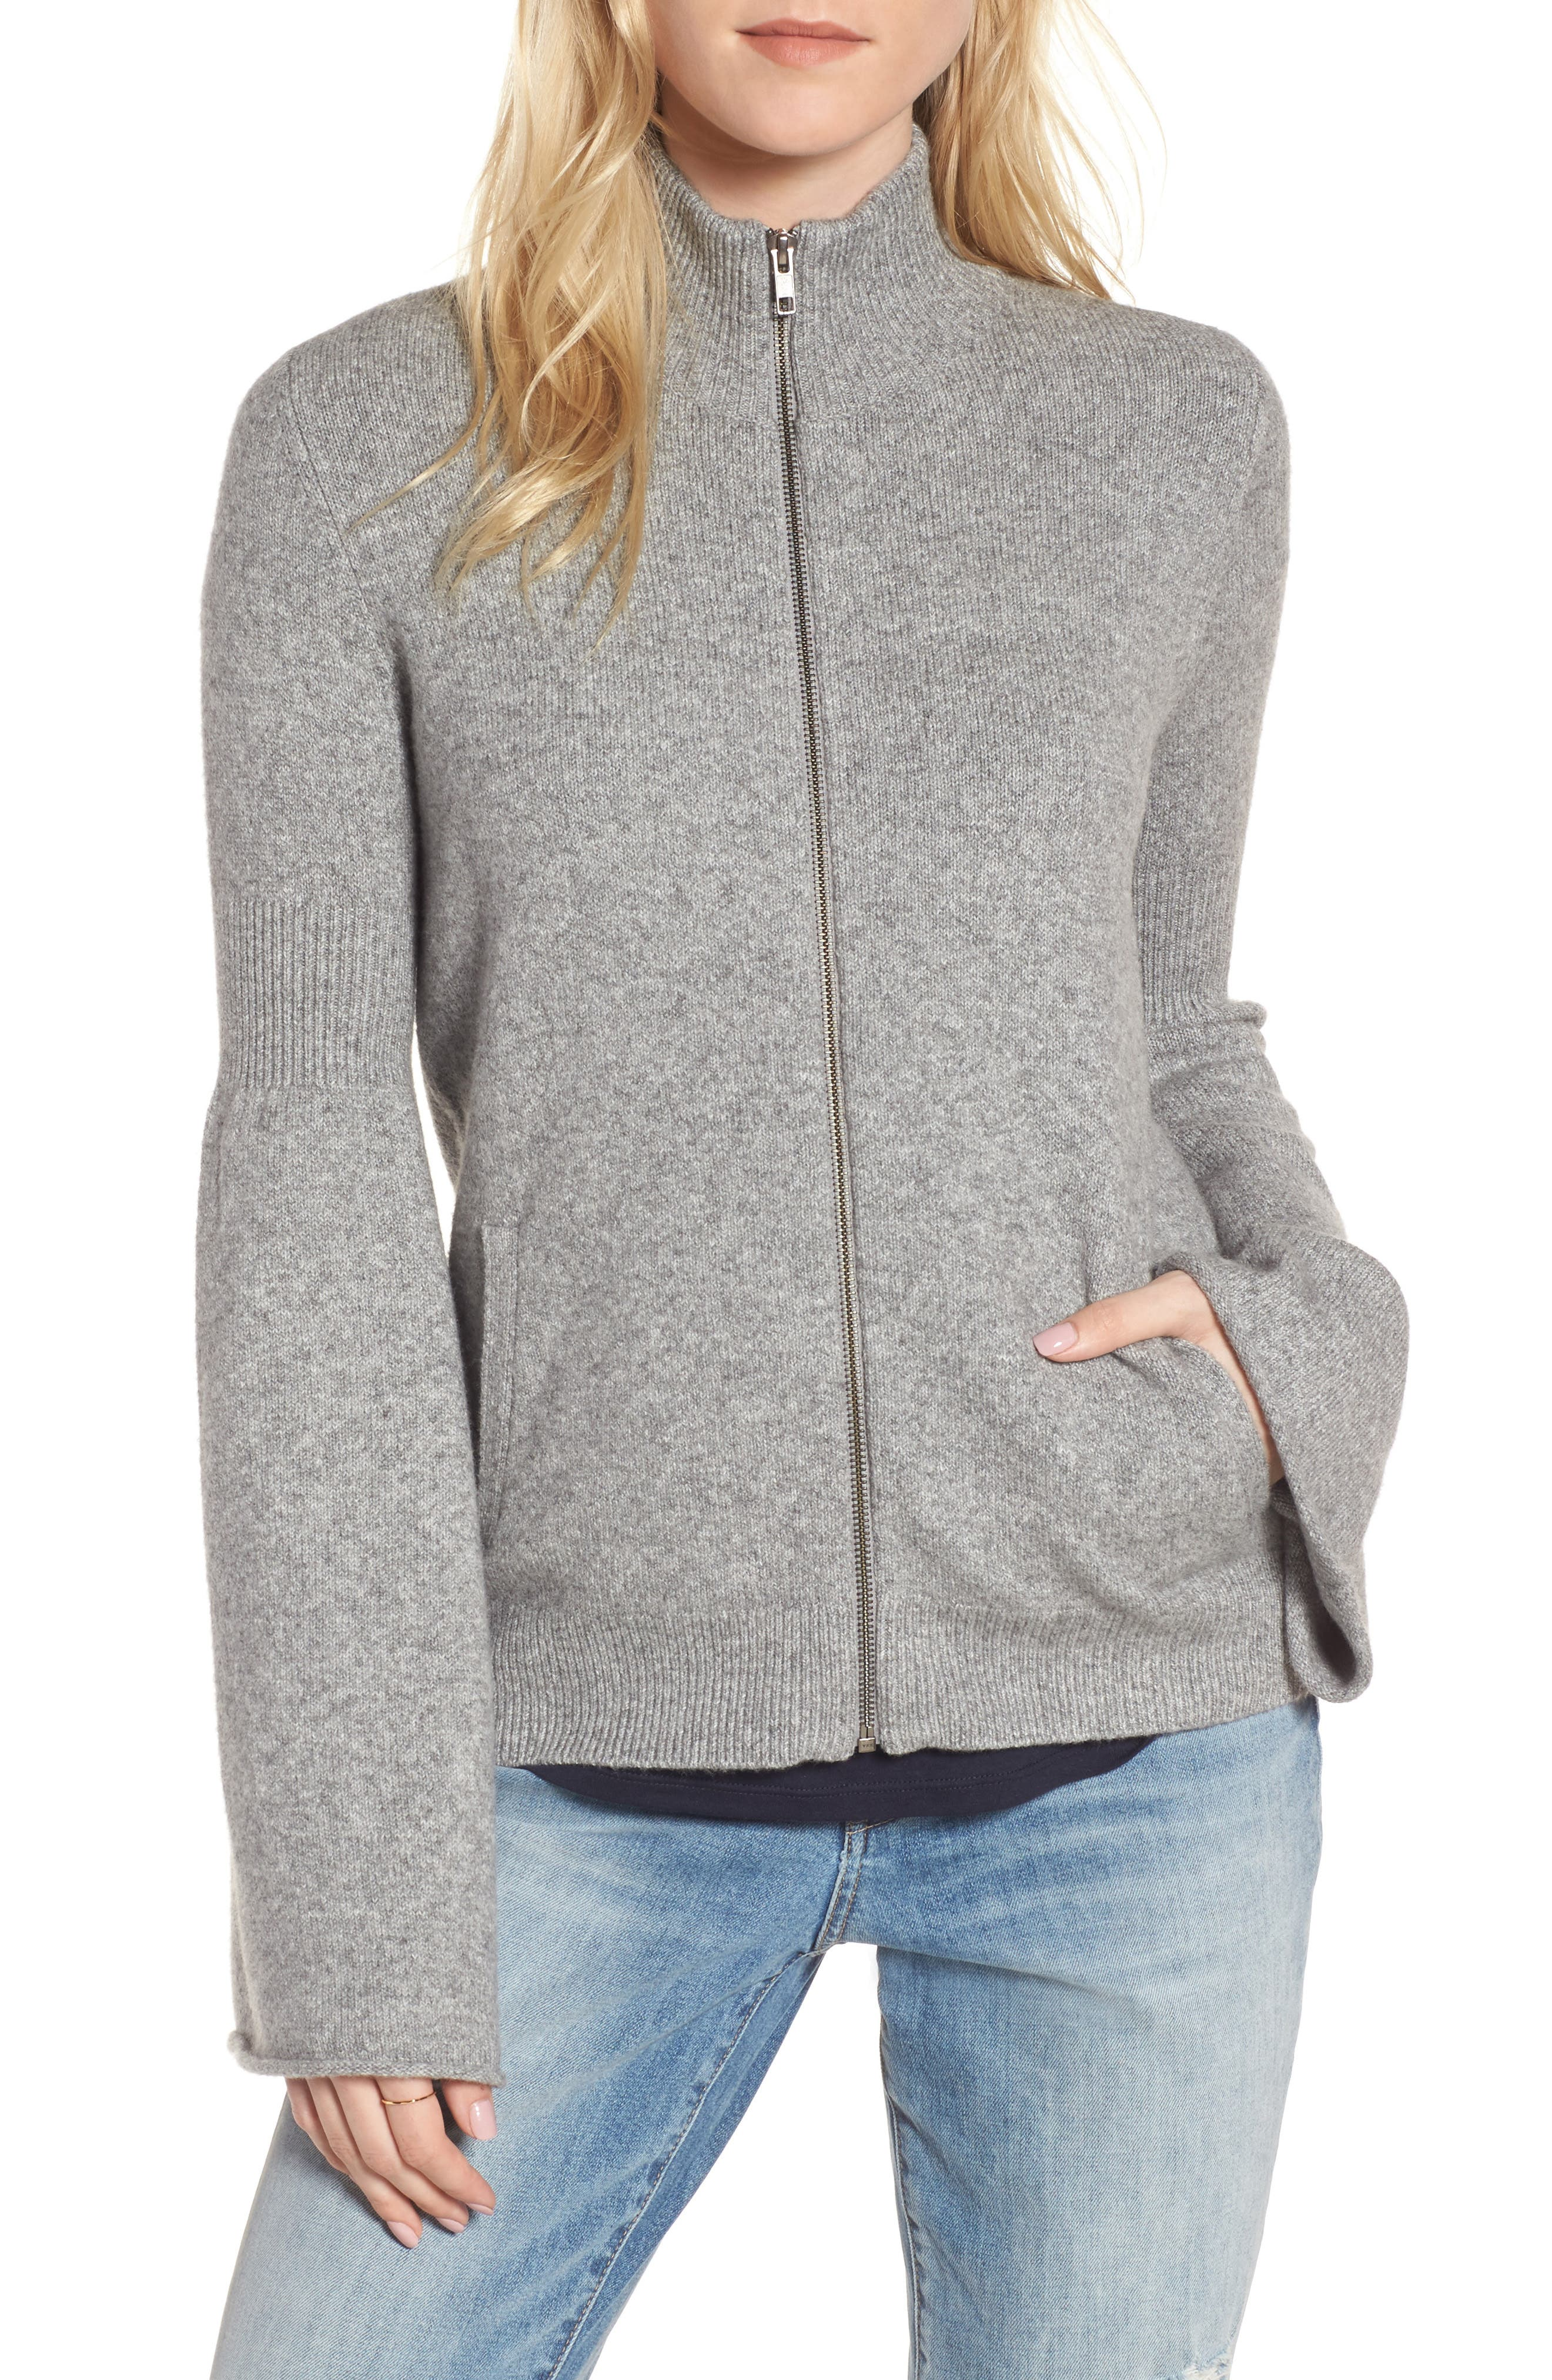 Flare Sleeve Track Jacket,                             Main thumbnail 1, color,                             Grey Heather